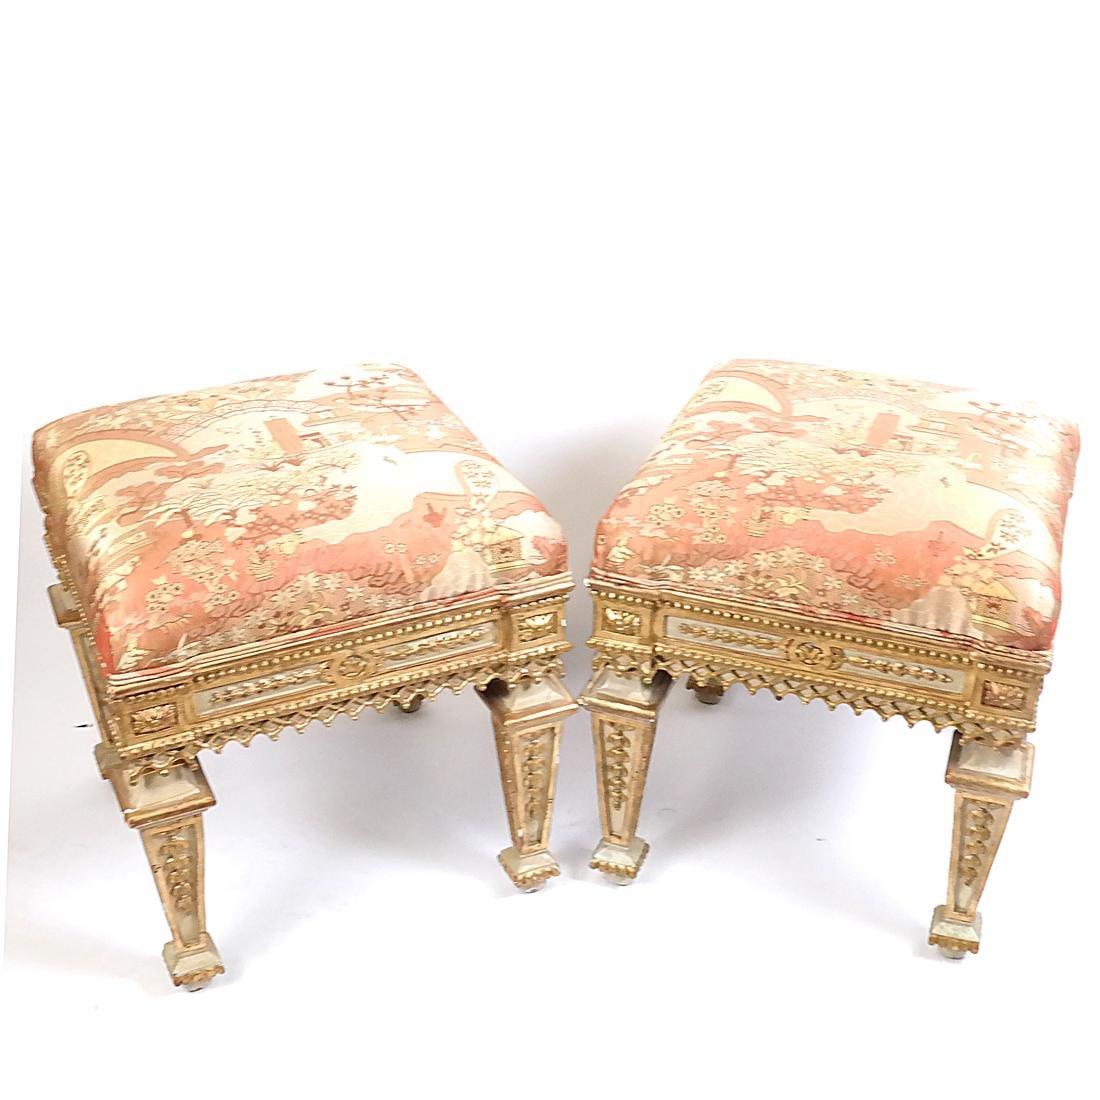 Pair of 19th Century Classical Stools - 7